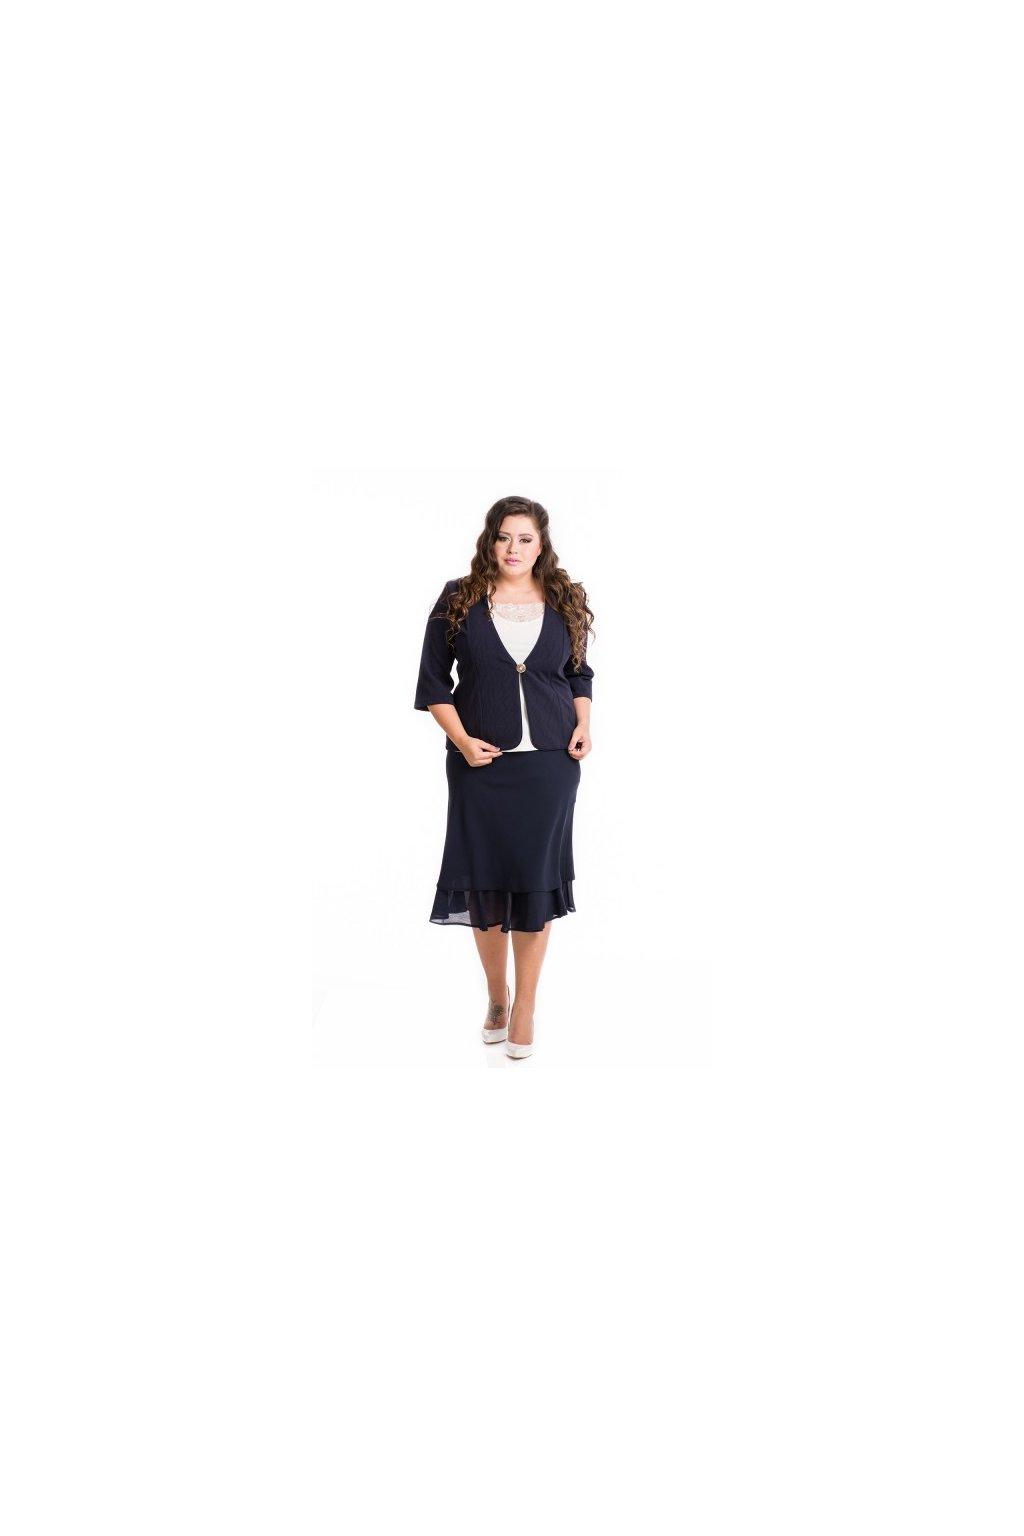 Atala puha csinos blezer Kek XL XXL 5XL molett ruha webaruhaz oromanya ruhak alkalmi ruhak moletteknek eskuvore eskuvore alkalmi ruha